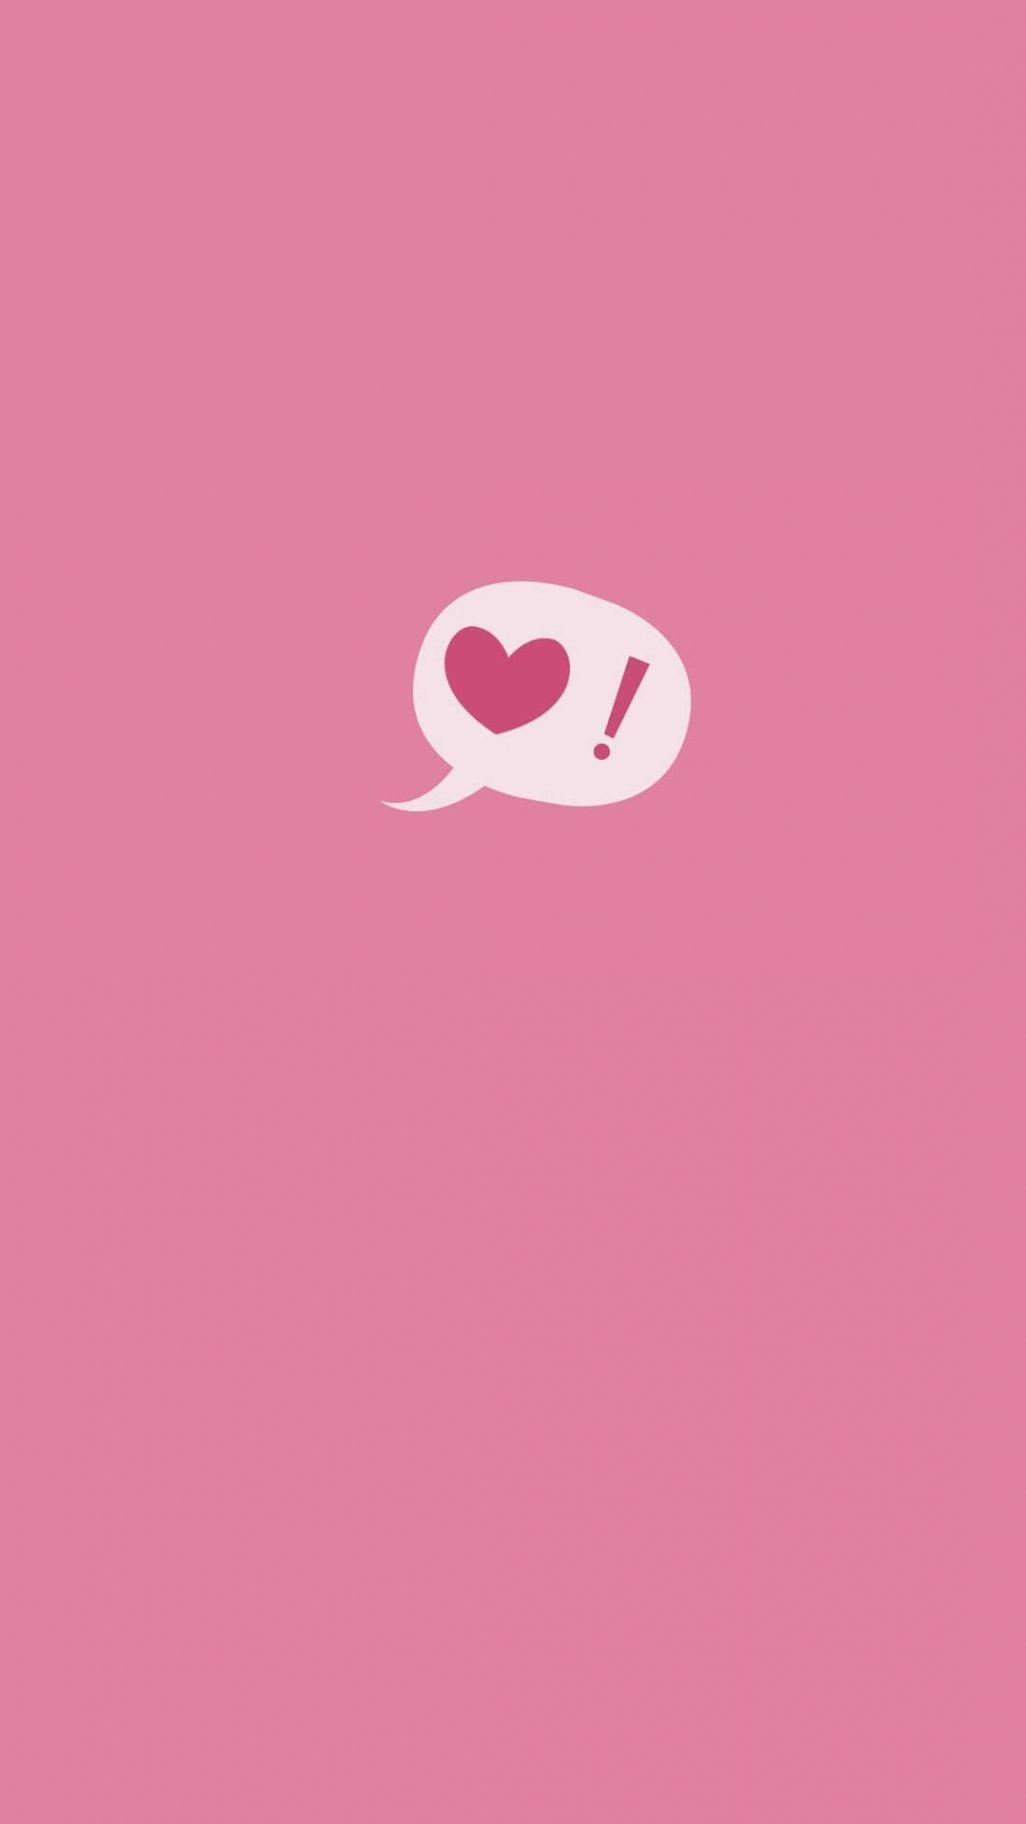 Iphone Wallpapers Tumblr Pink  Wallpaper Cave